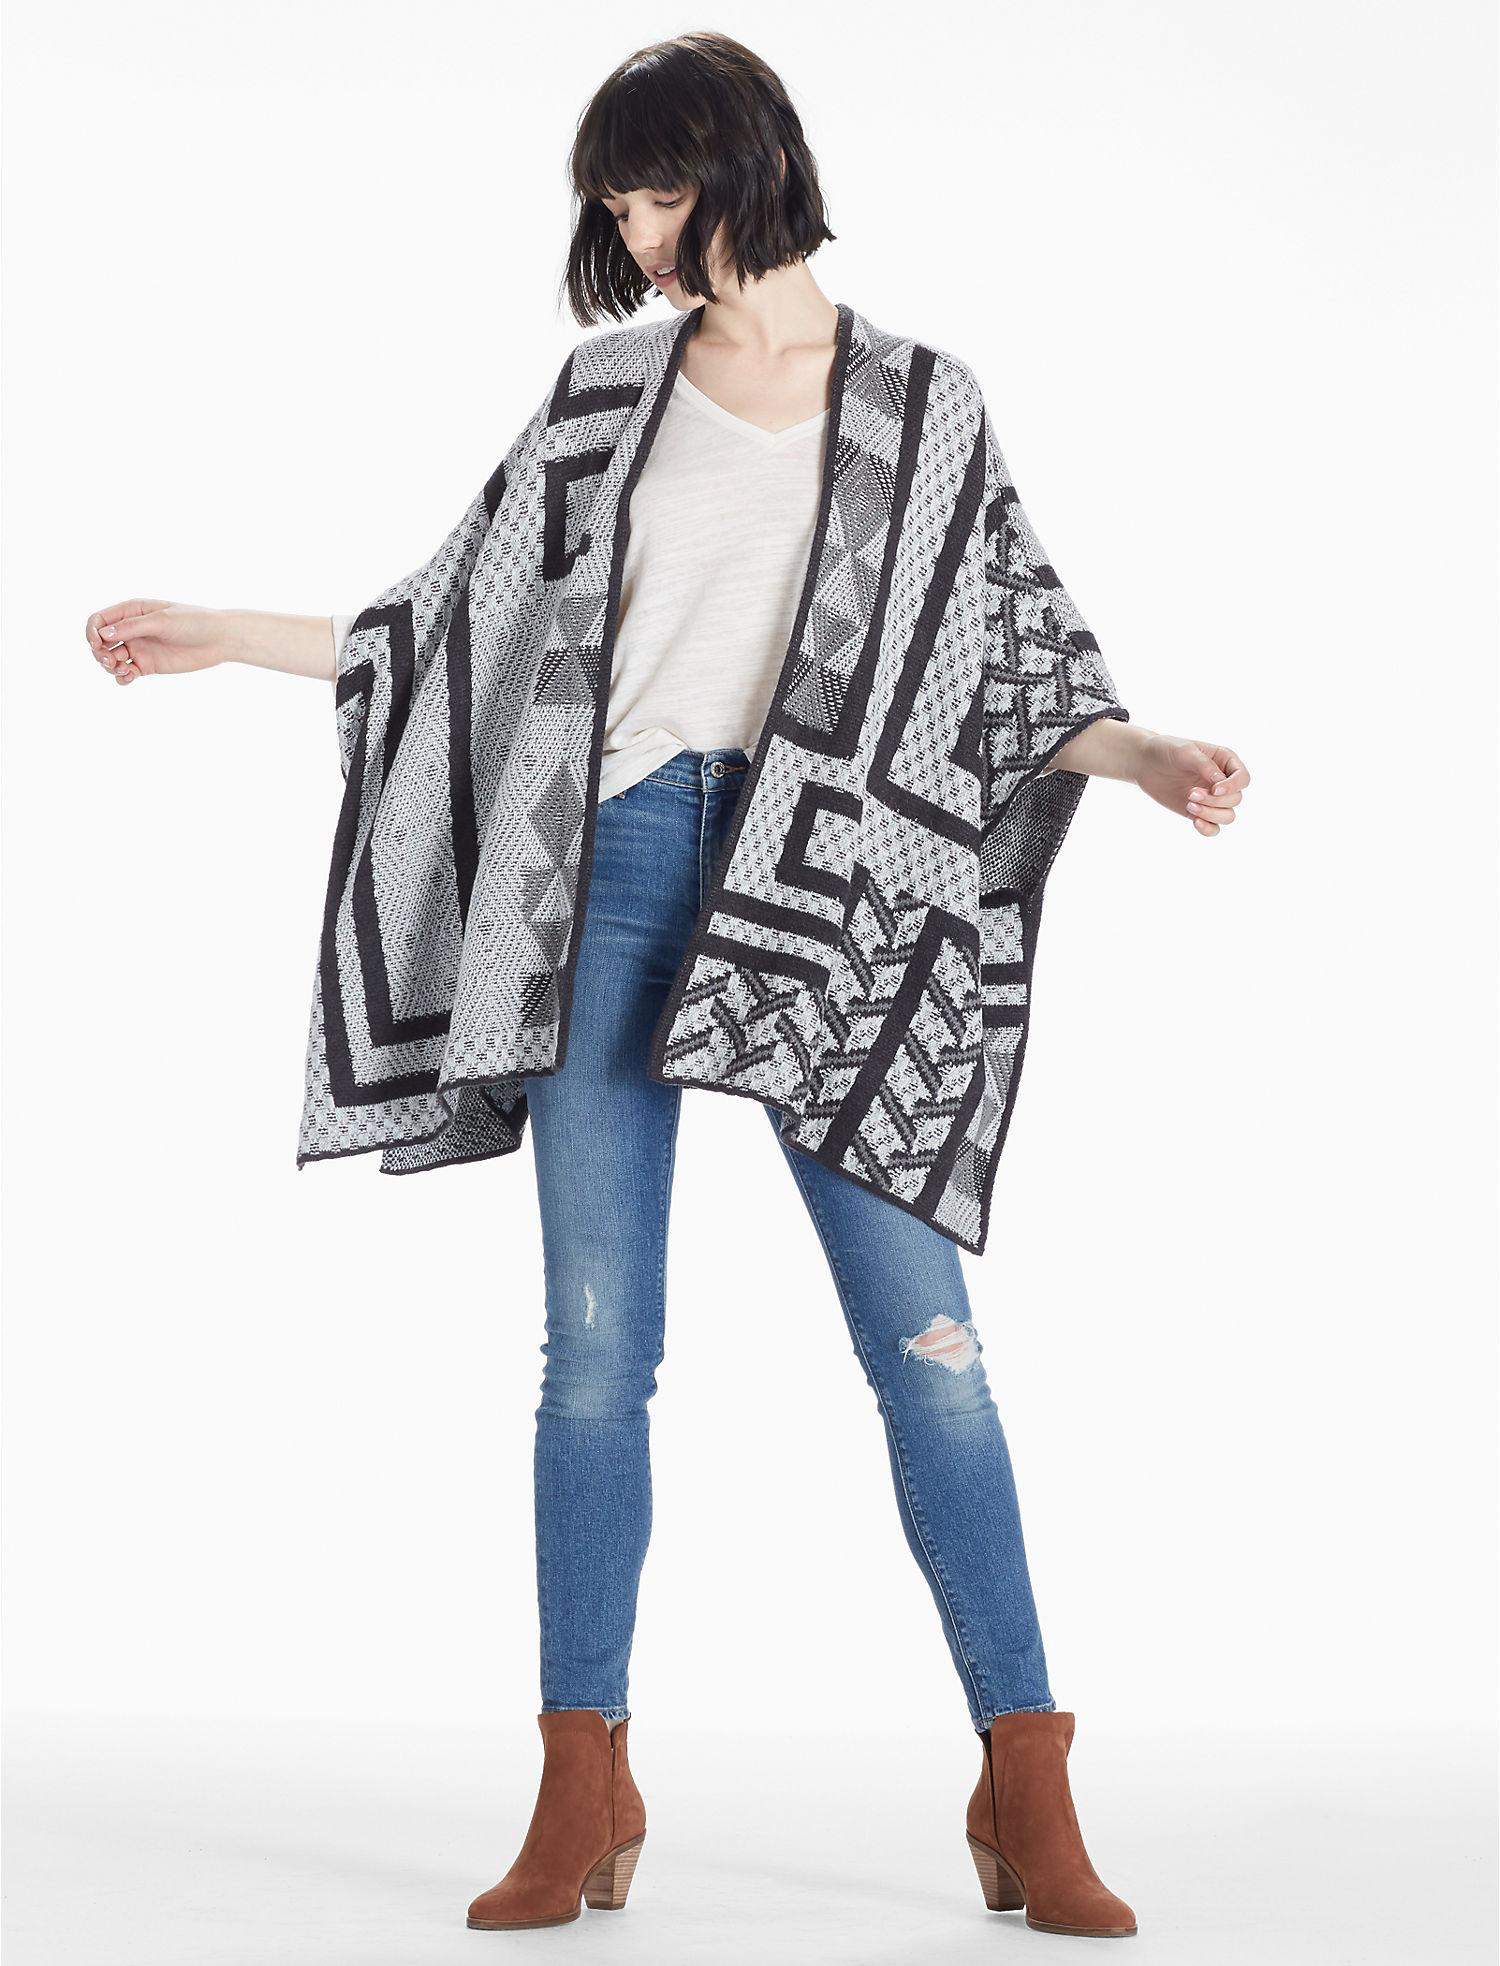 Lucky Intarsia Sweater Poncho $89.50